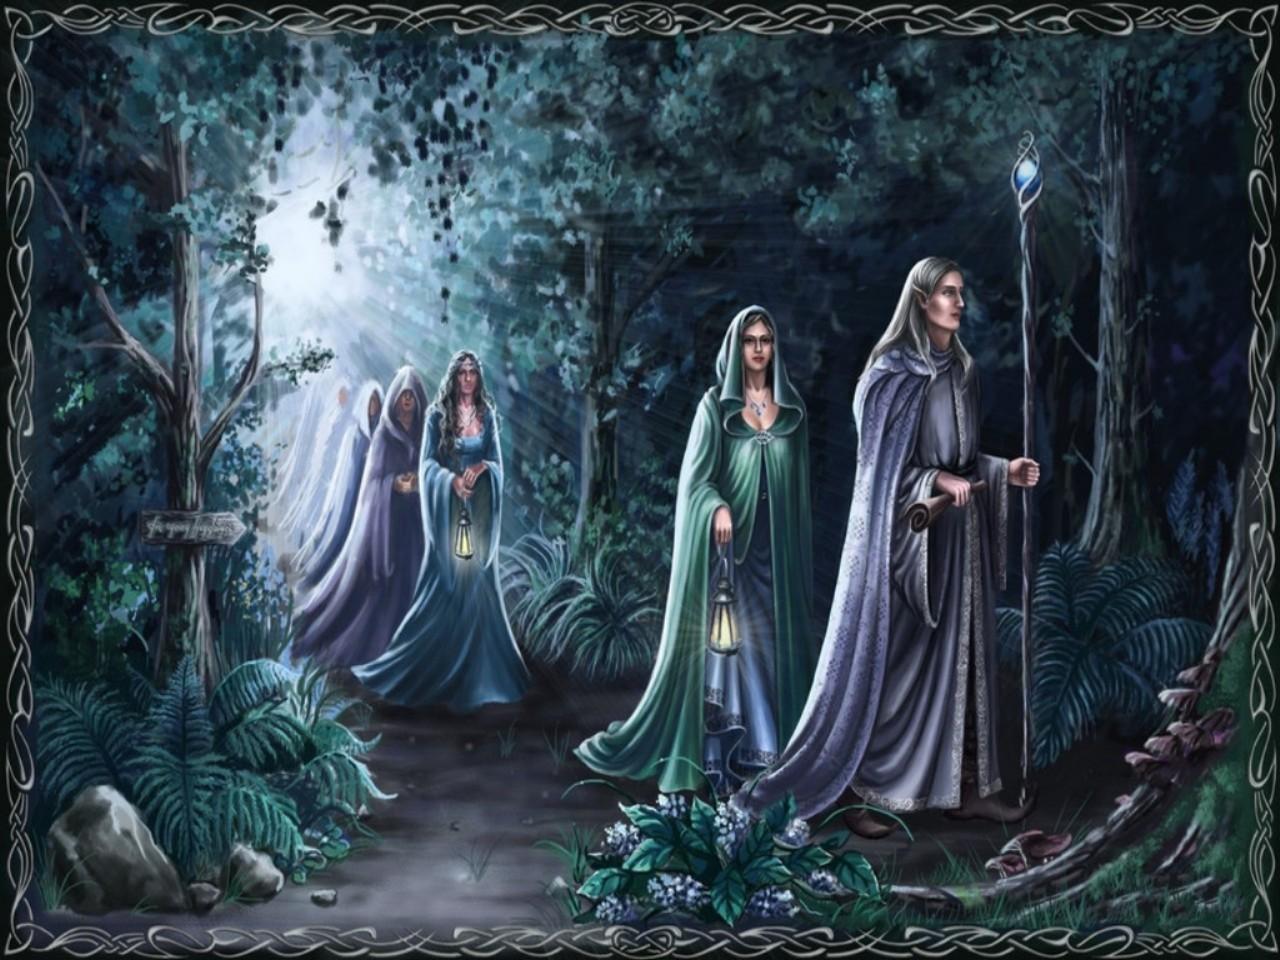 Elves in the Forest Computer Wallpapers Desktop 1280x960